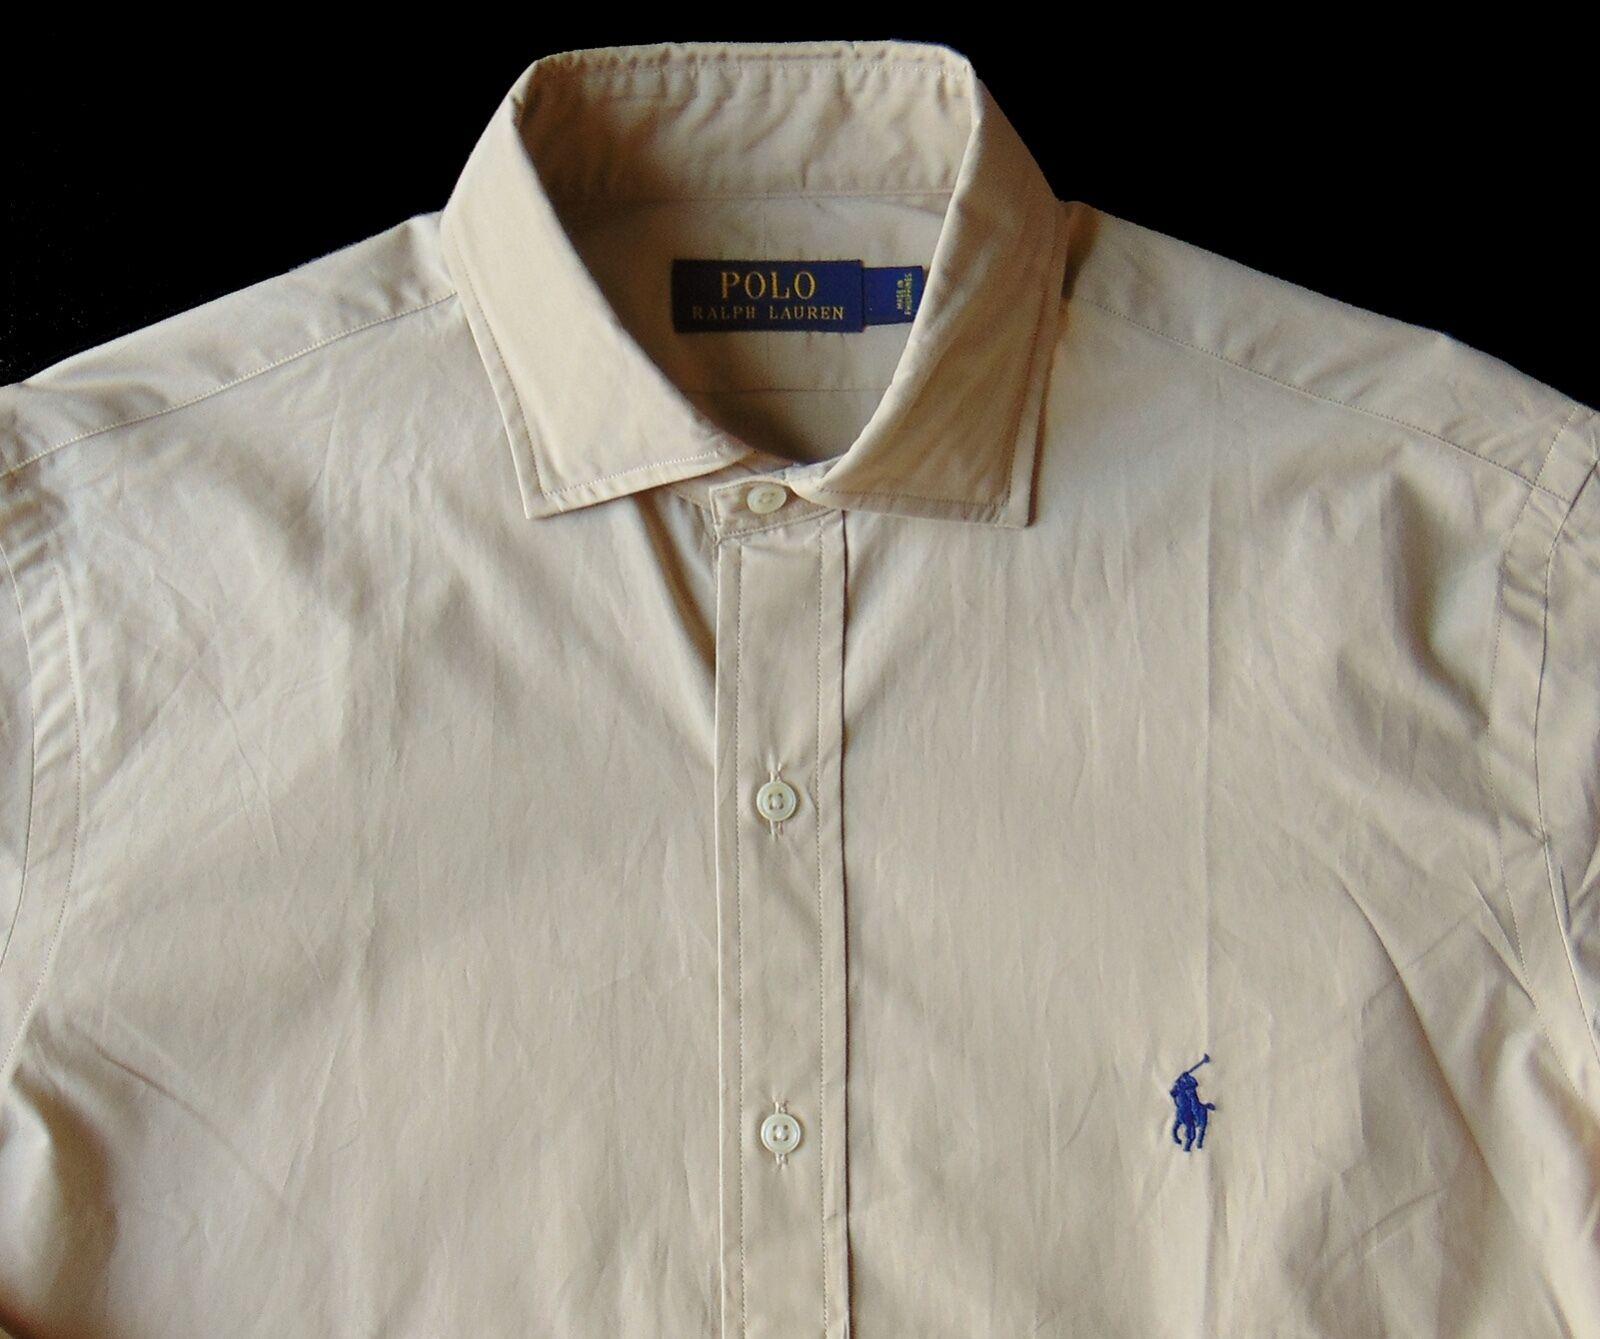 Men's POLO RALPH LAUREN Khaki Tan Poplin Cotton Shirt S Small NWT NEW Nice